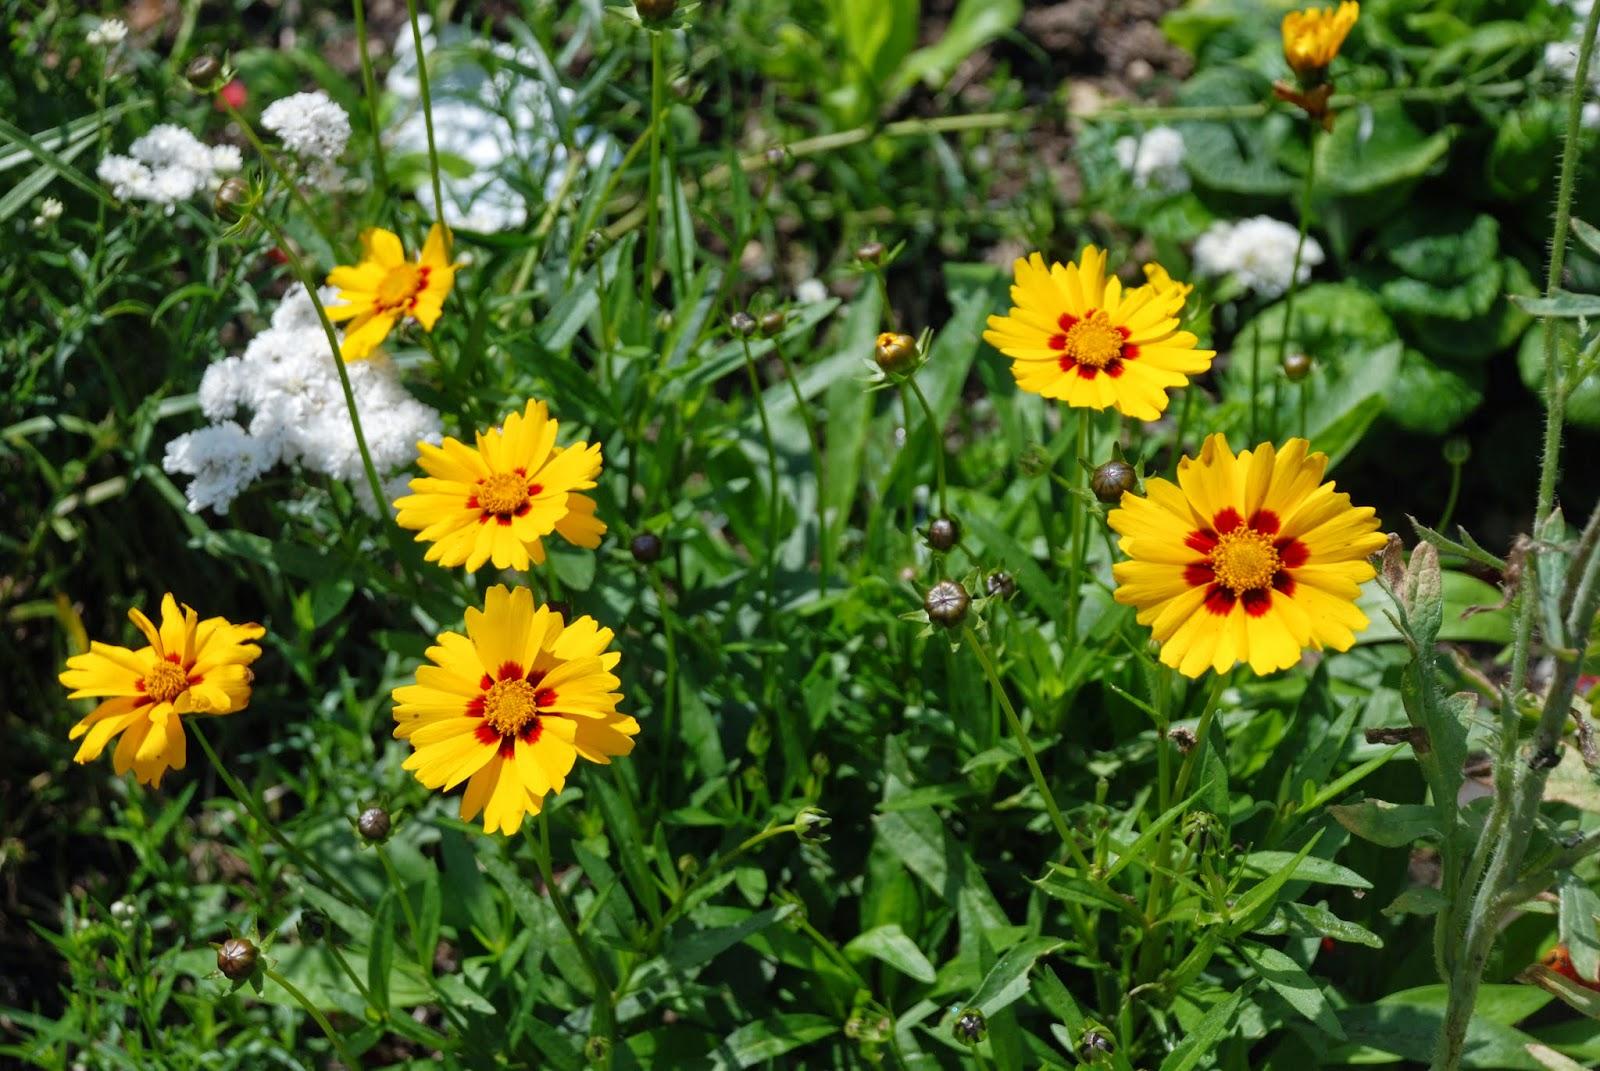 Bickenbach Blumen Madchenauge Gro0ssblutiges Madchenauge